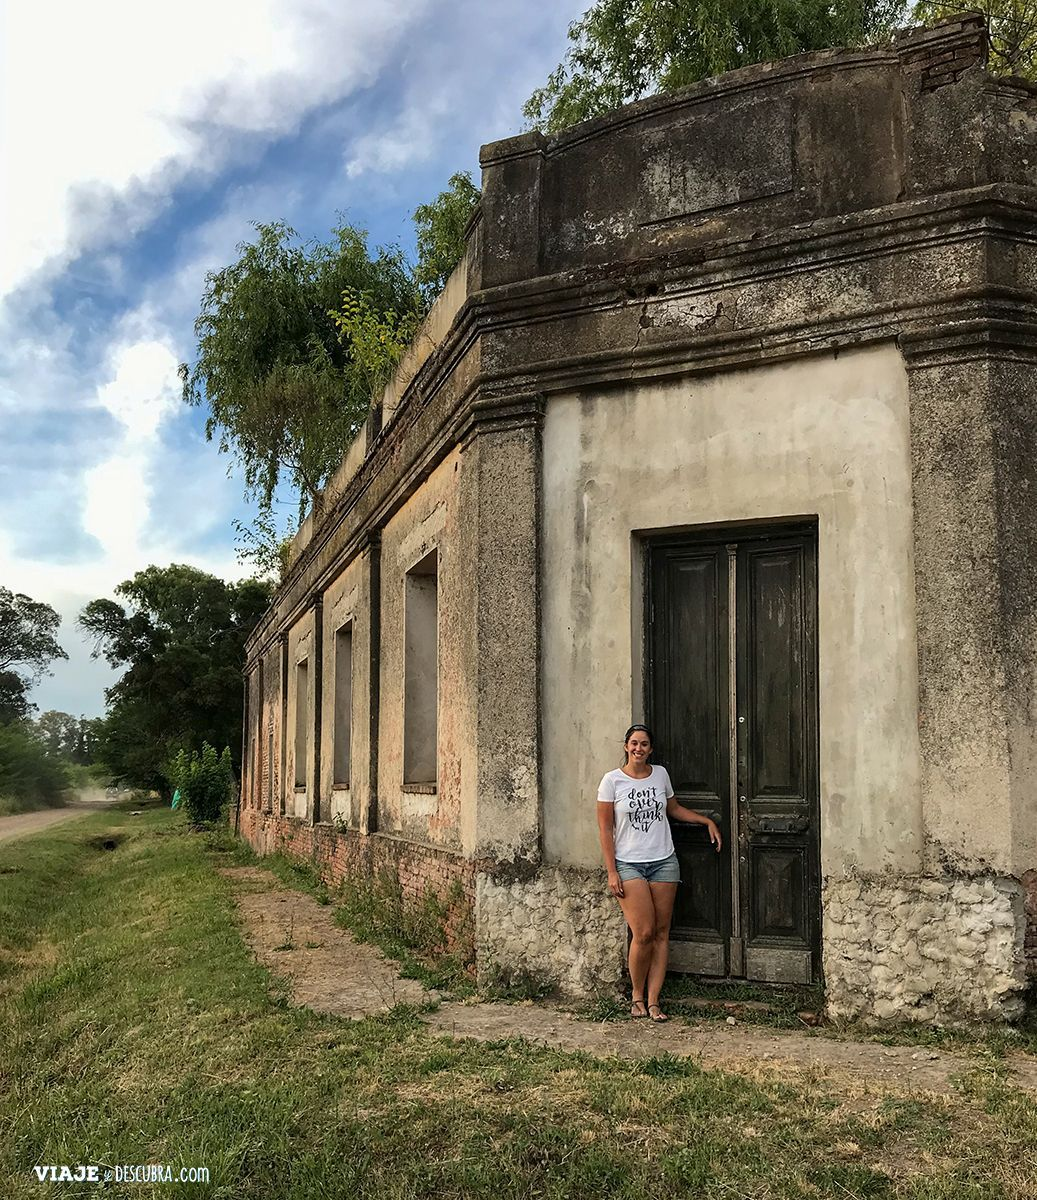 antiguas-casonas-Uribelarrea,-pueblo-turistico,-buenos-aires,-argentina